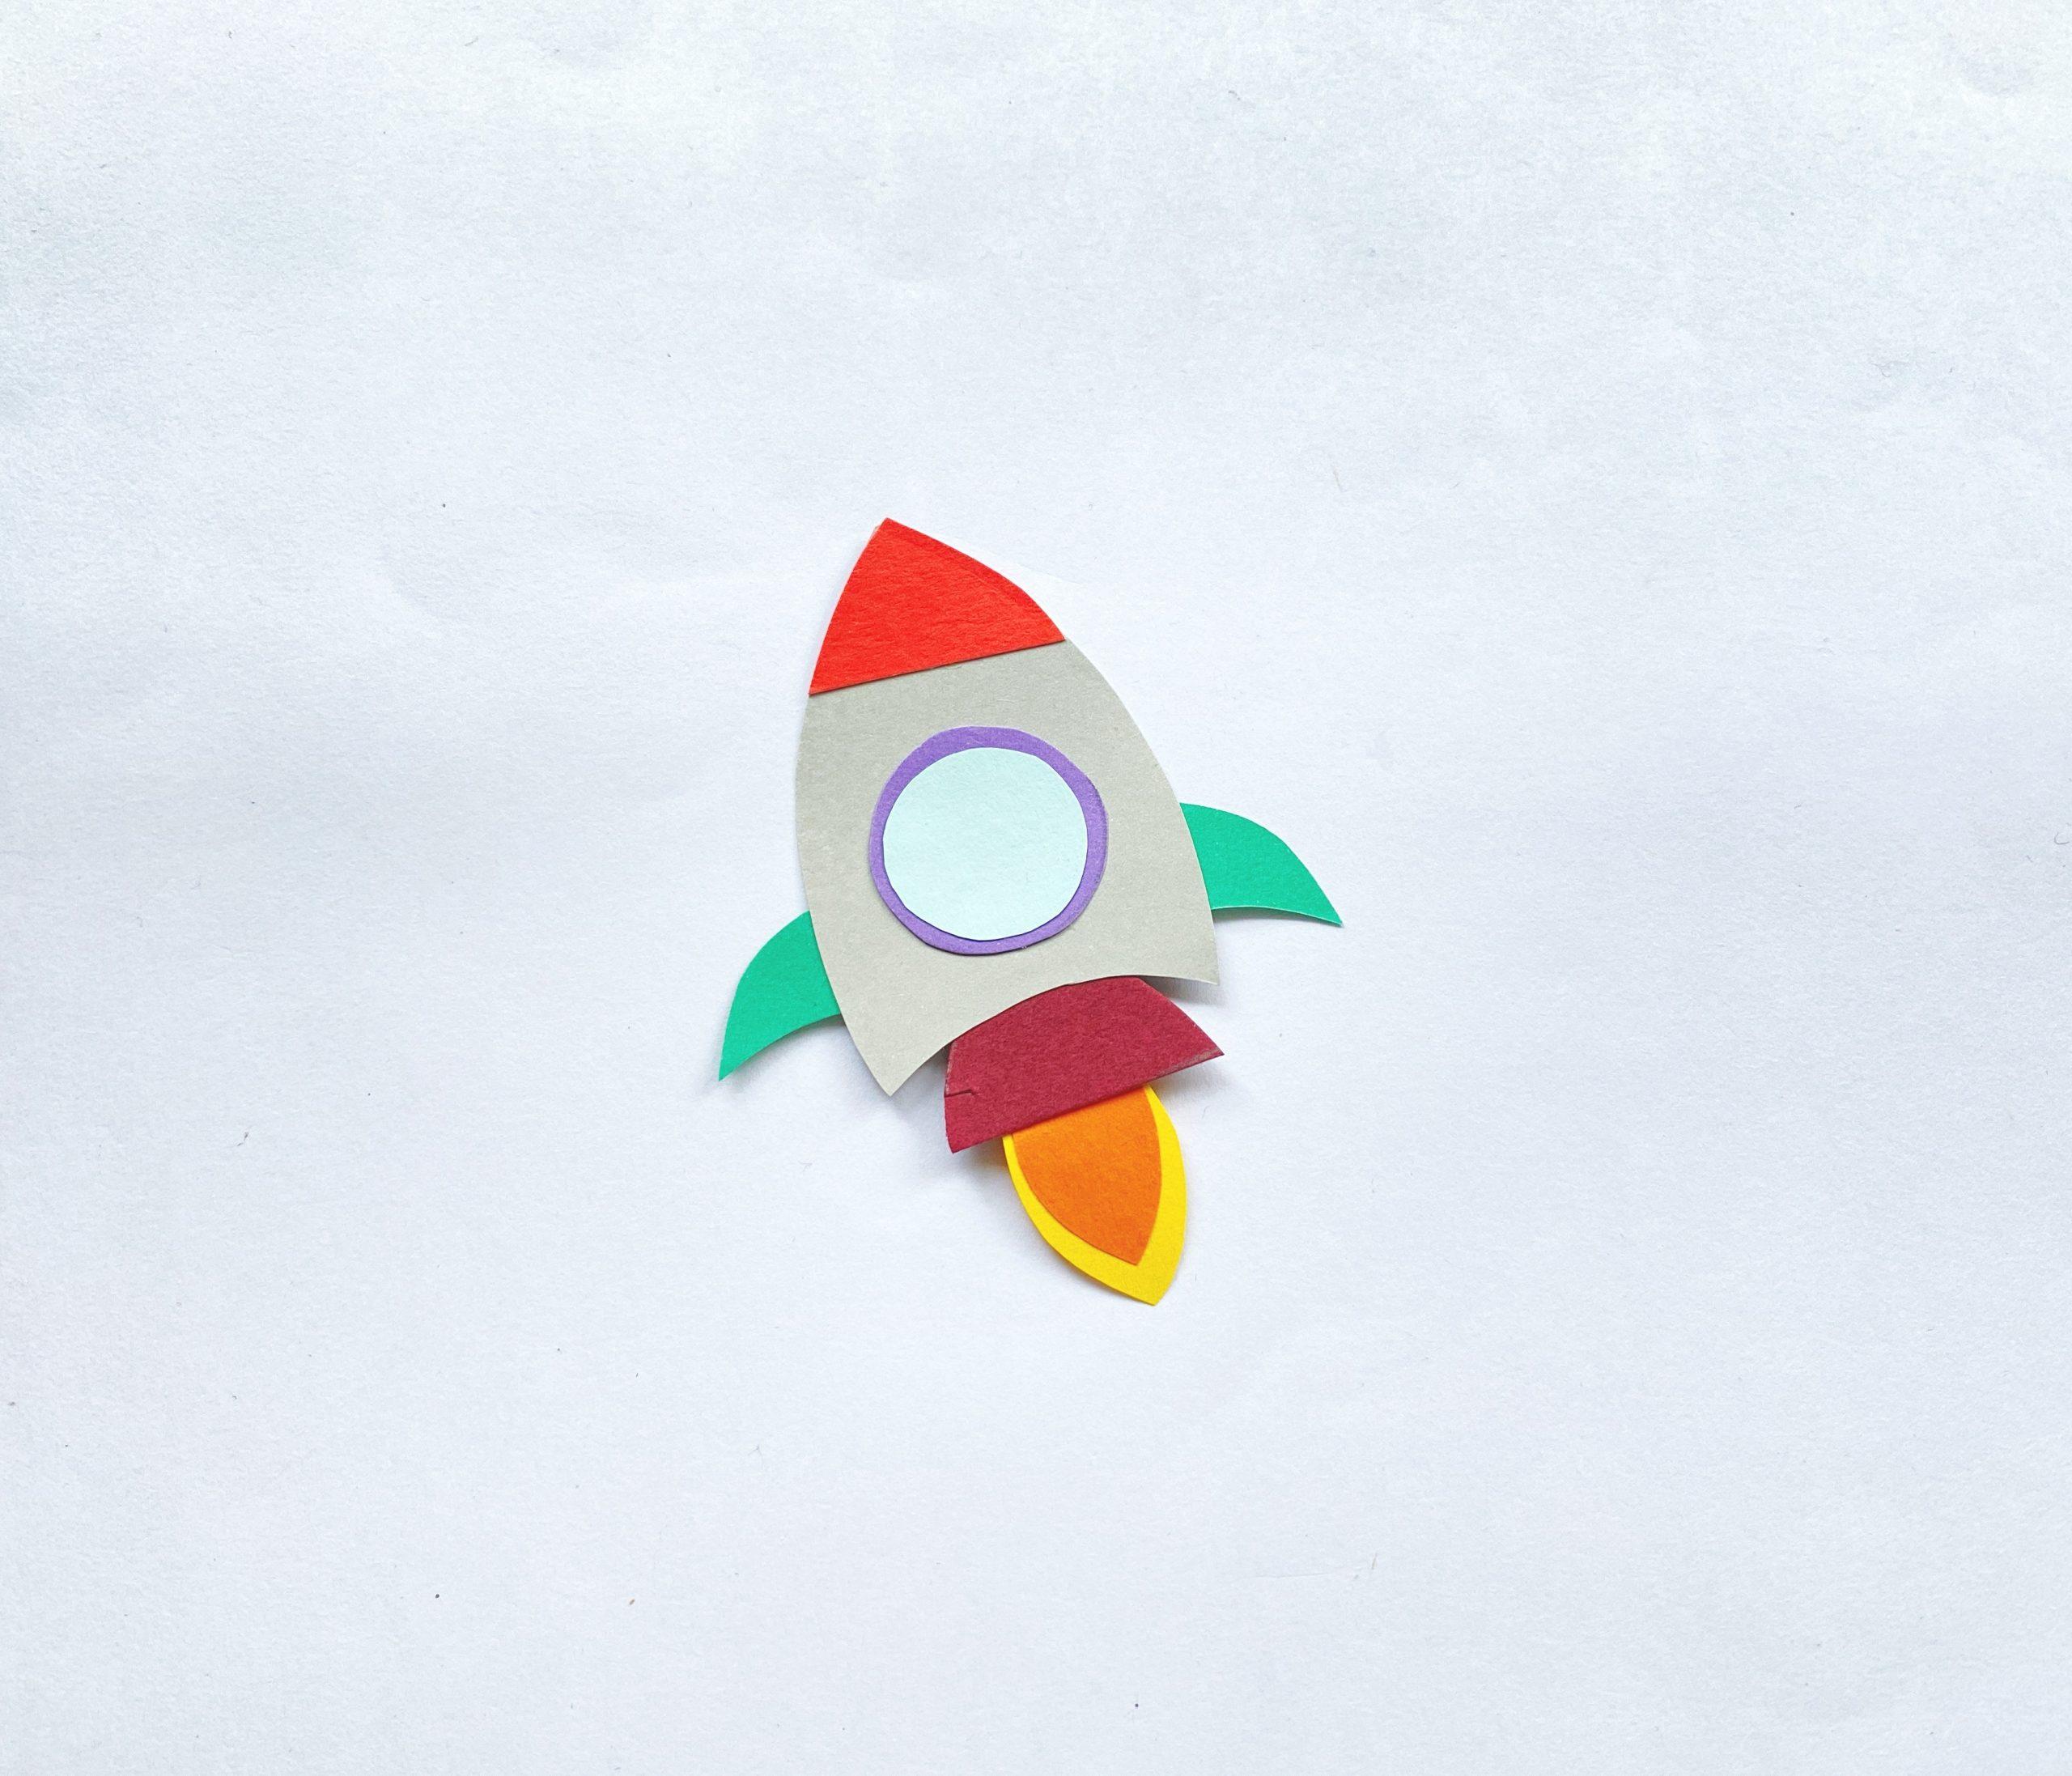 paper rocket craft process